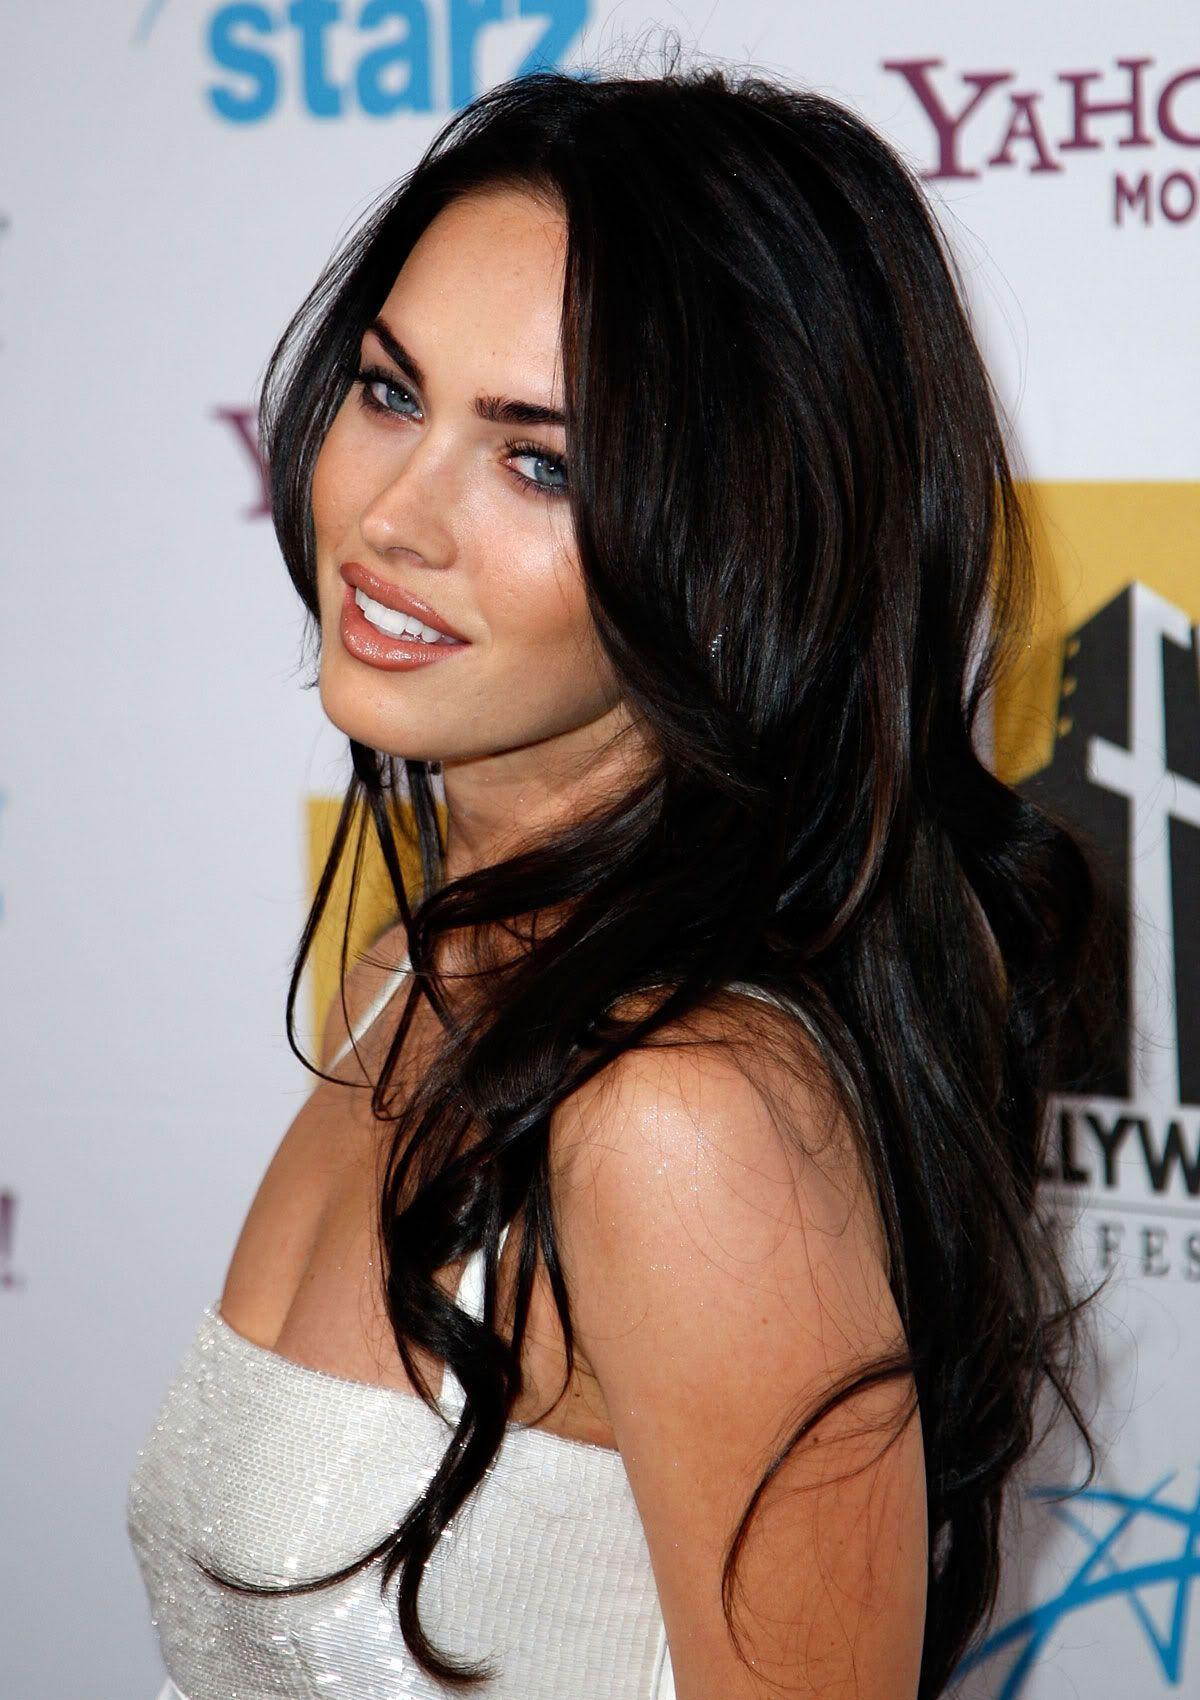 Best Megan Fox Hairstyles Our Top 10 Megan Fox Hair Dark Hair Blue Eyes Hair Styles